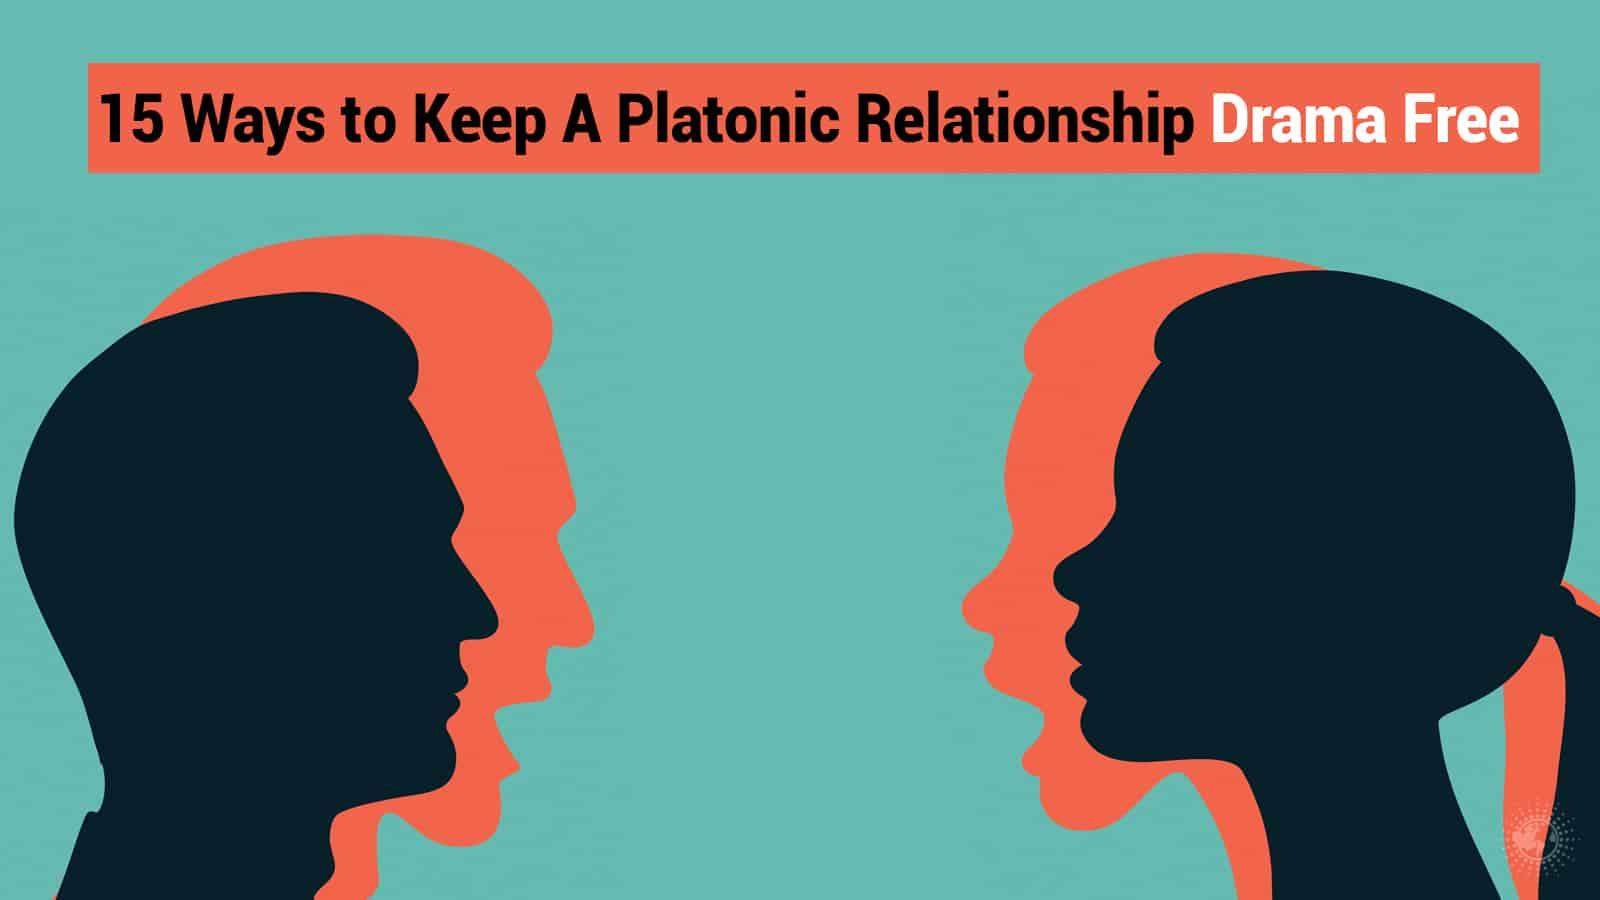 15 Ways to Keep A Platonic Relationship Drama Free